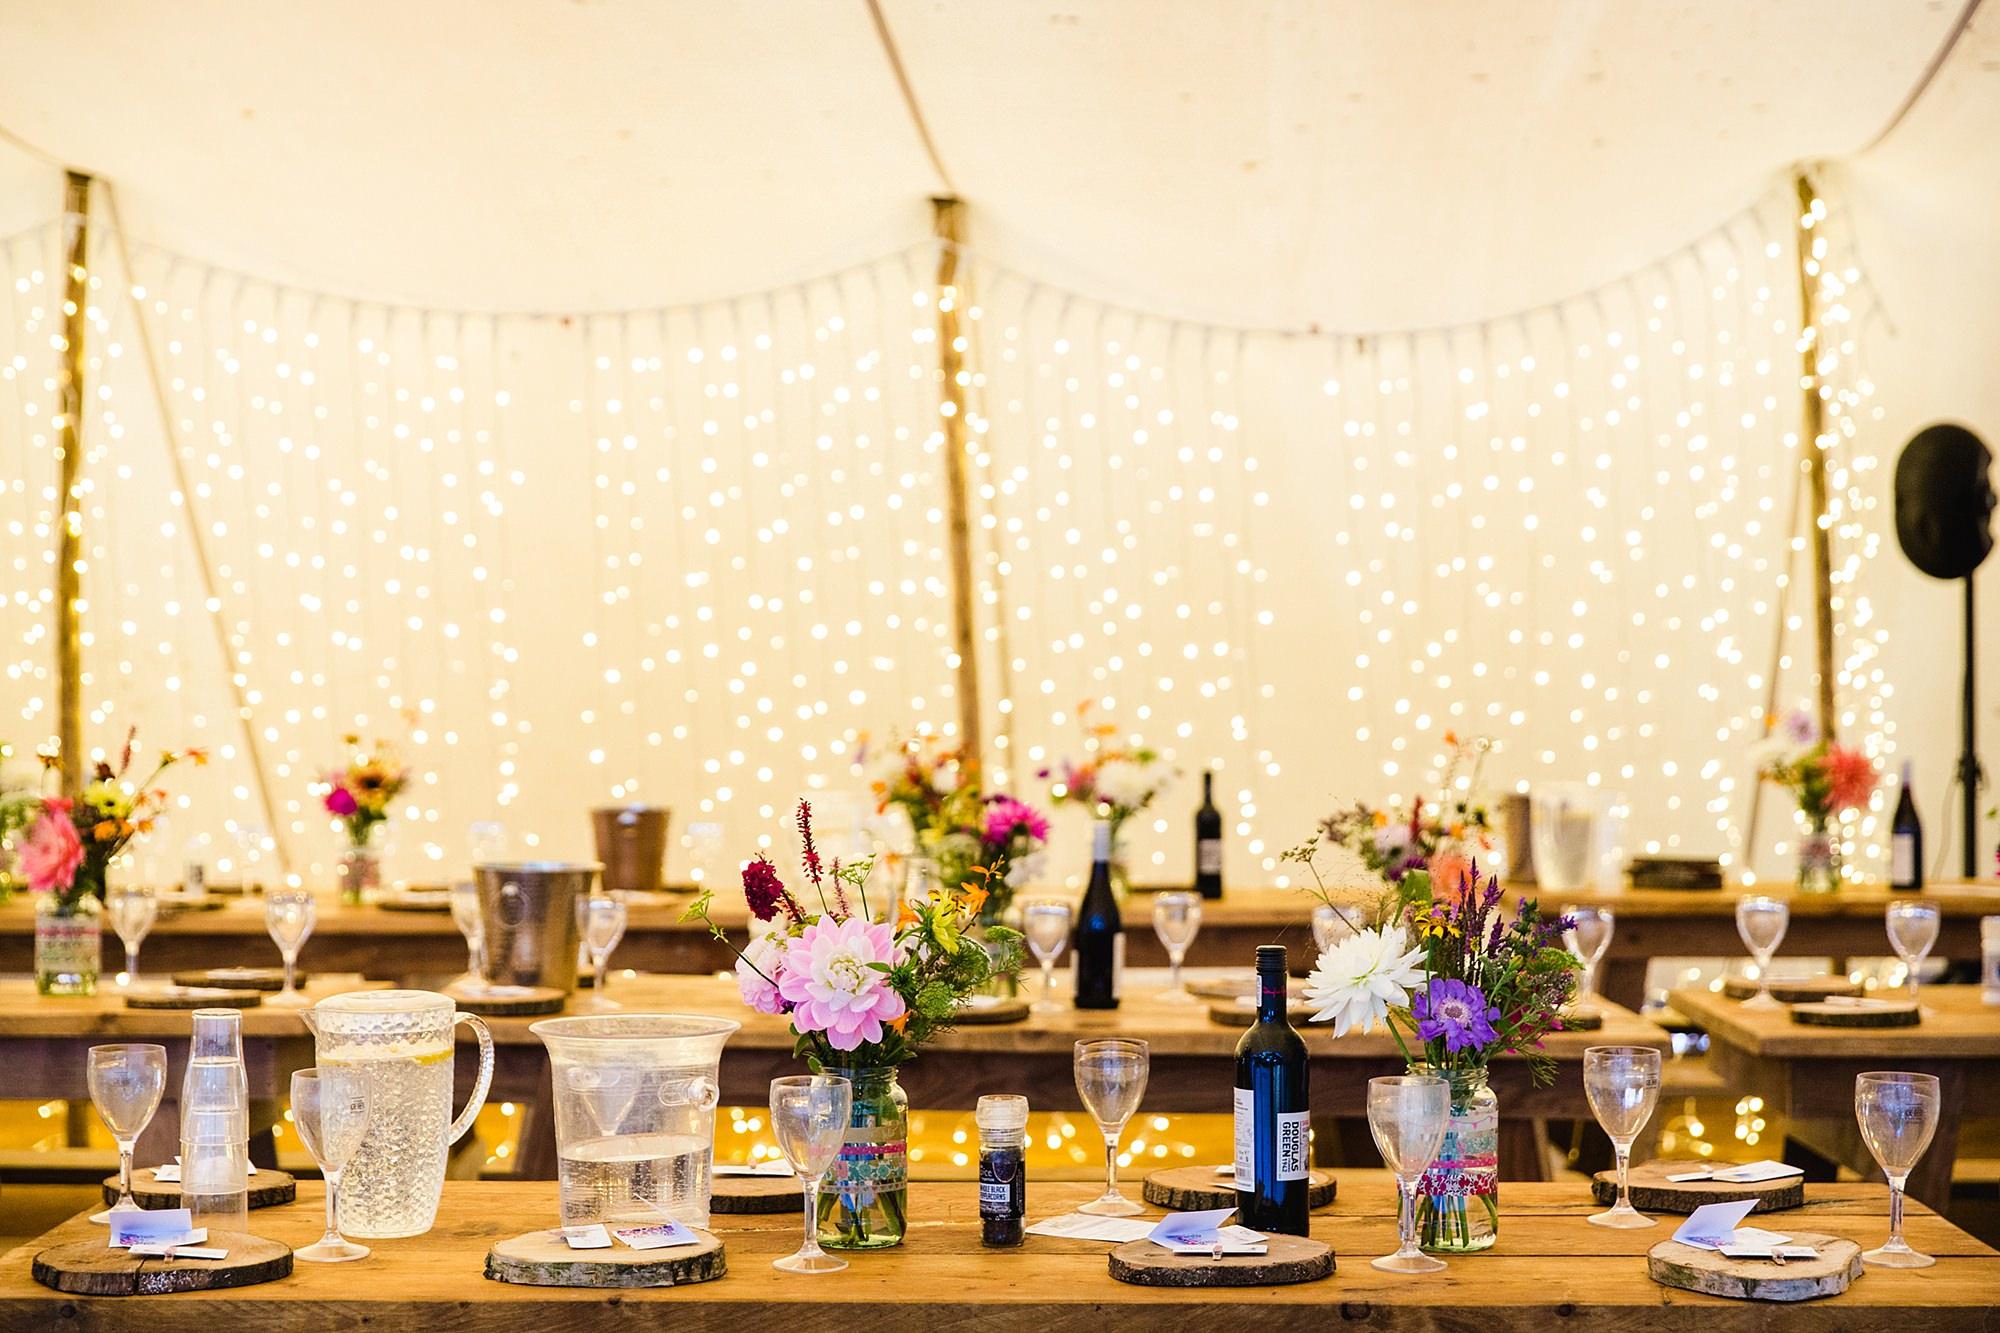 Woodland Weddings Tring wedding table decorations